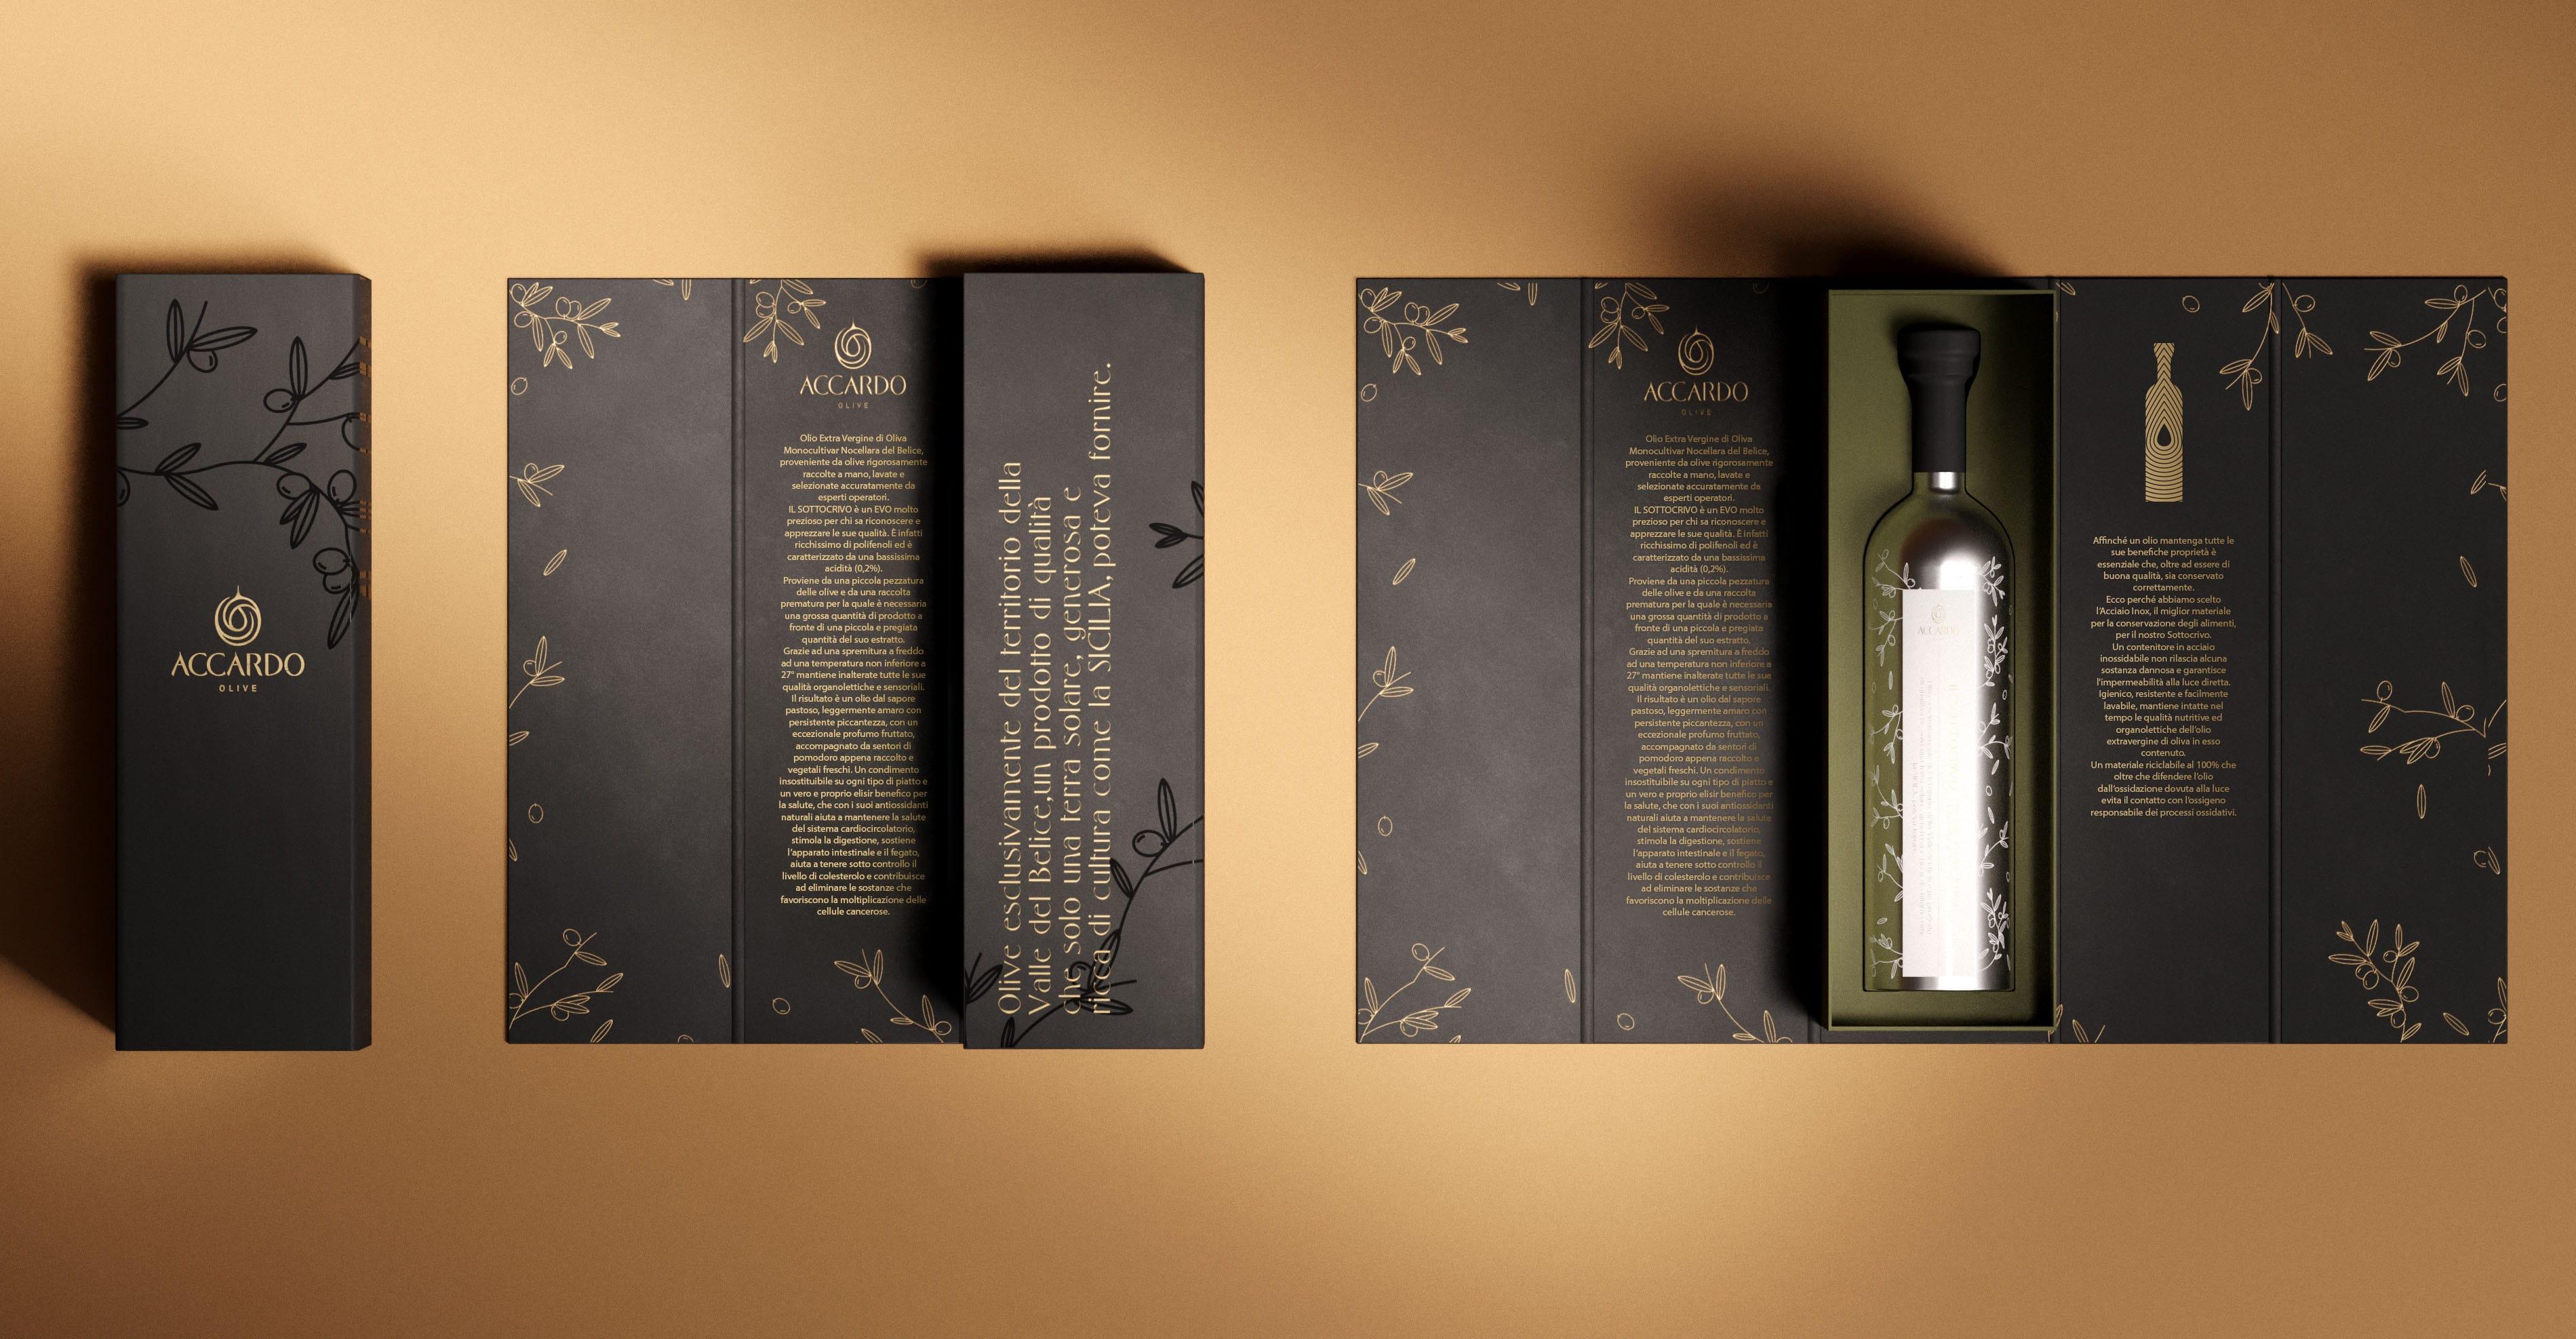 adduma_accardo_sottocrivo_olio_packaging_02